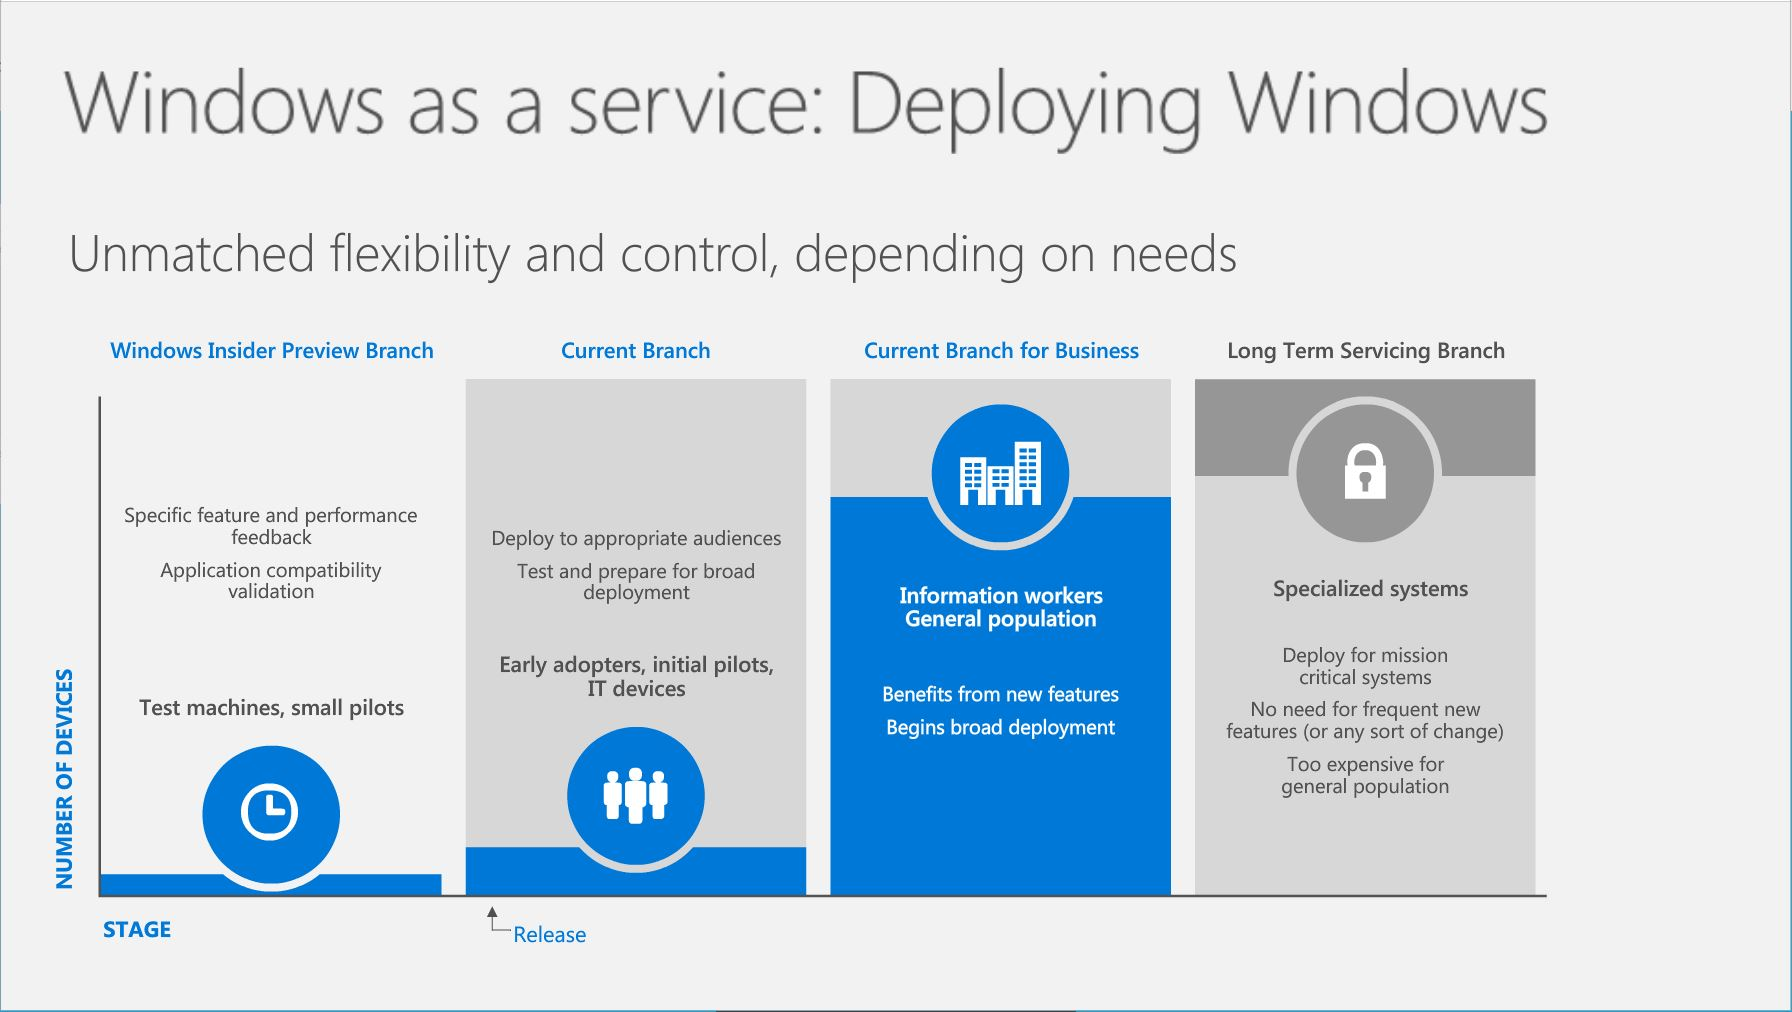 Windows ltsb upgrade | How to Upgrade to Windows 10 Enterprise